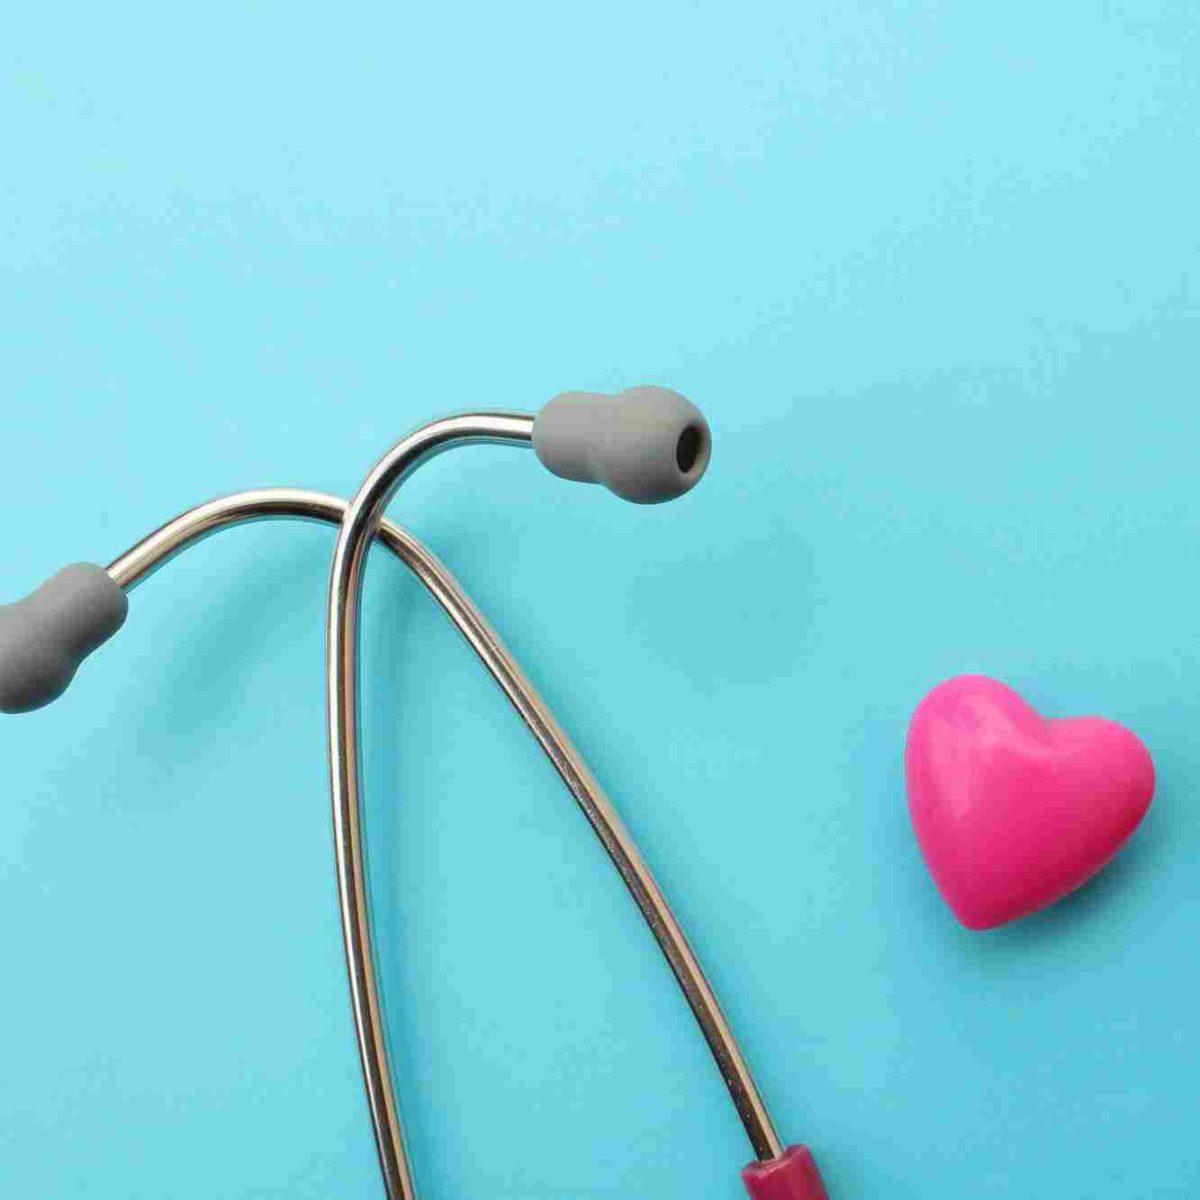 http://www.paragonanalysis.com/wp-content/uploads/2015/12/srce-i-stetoskop-1200x1200.jpg